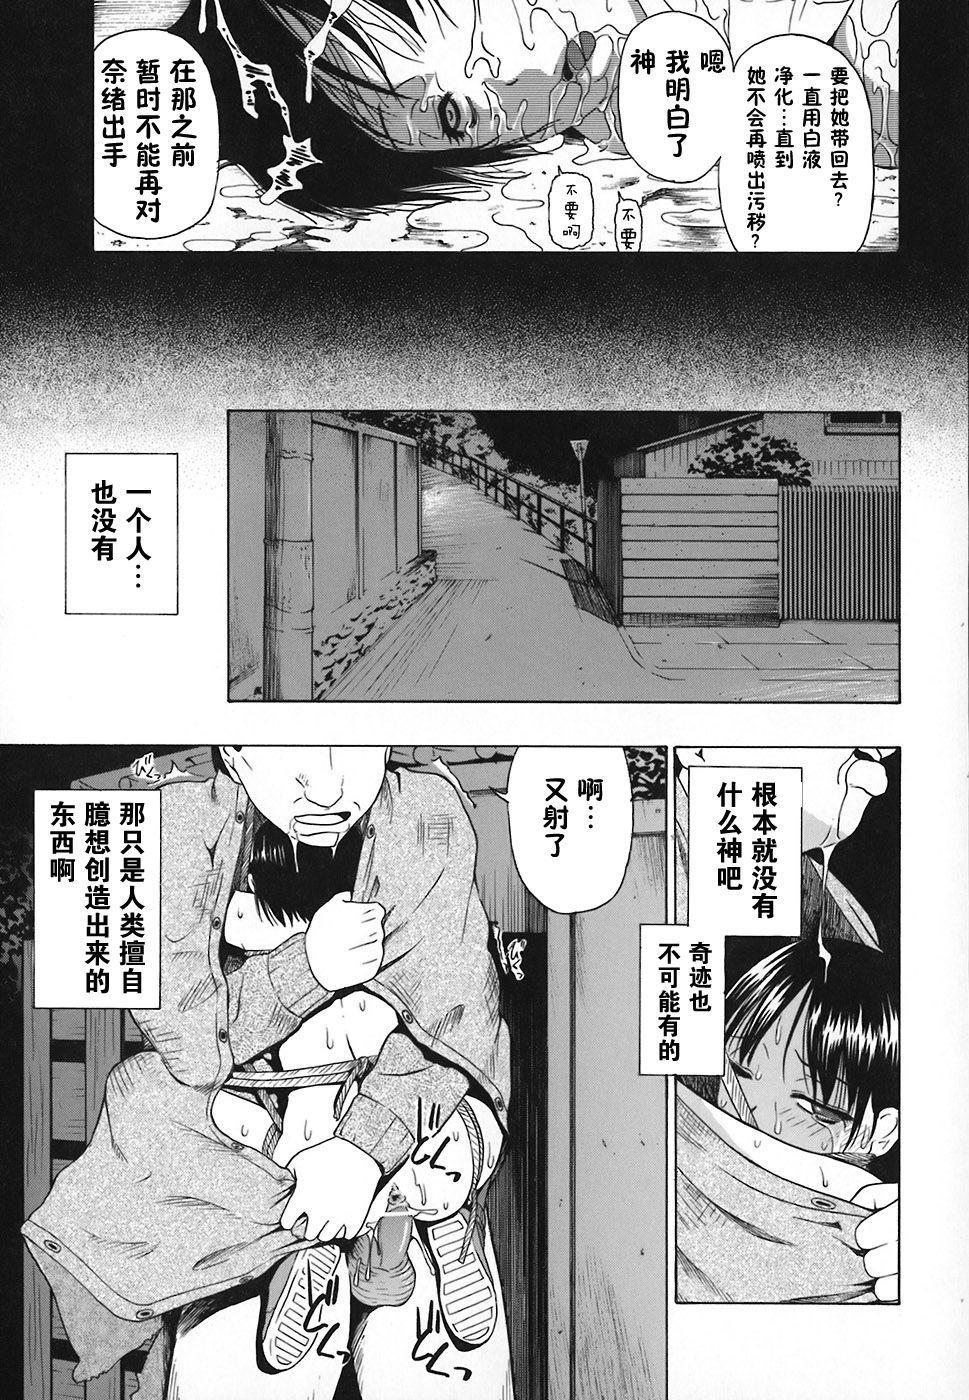 Akutoku no Sakae - Prosperites du Vice 126